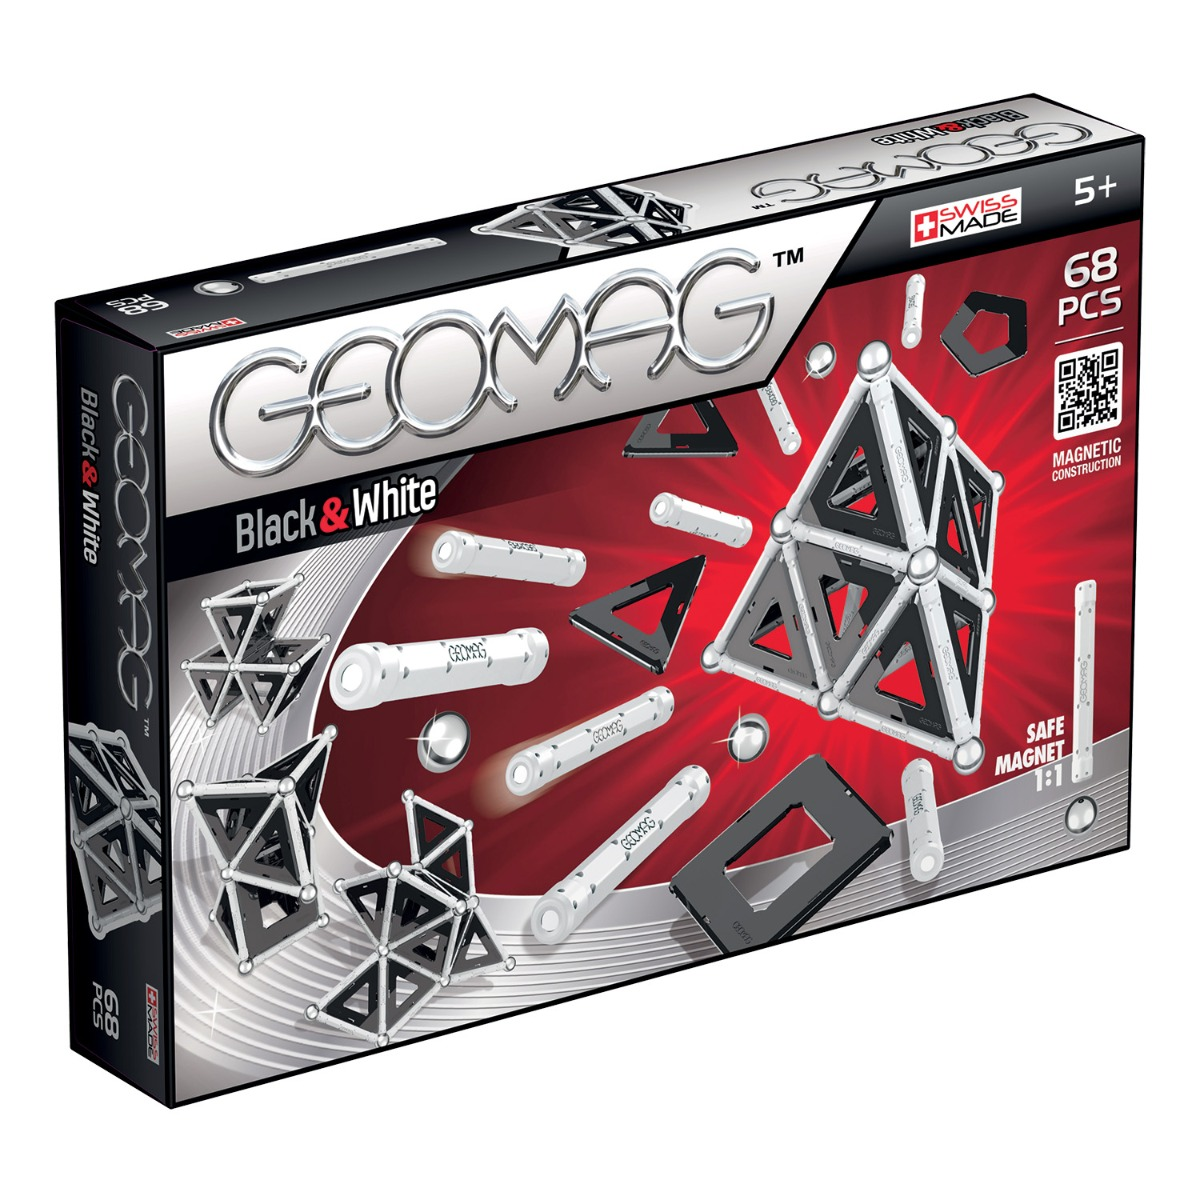 Joc de constructie magnetic Geomag Black and White, 68 piese